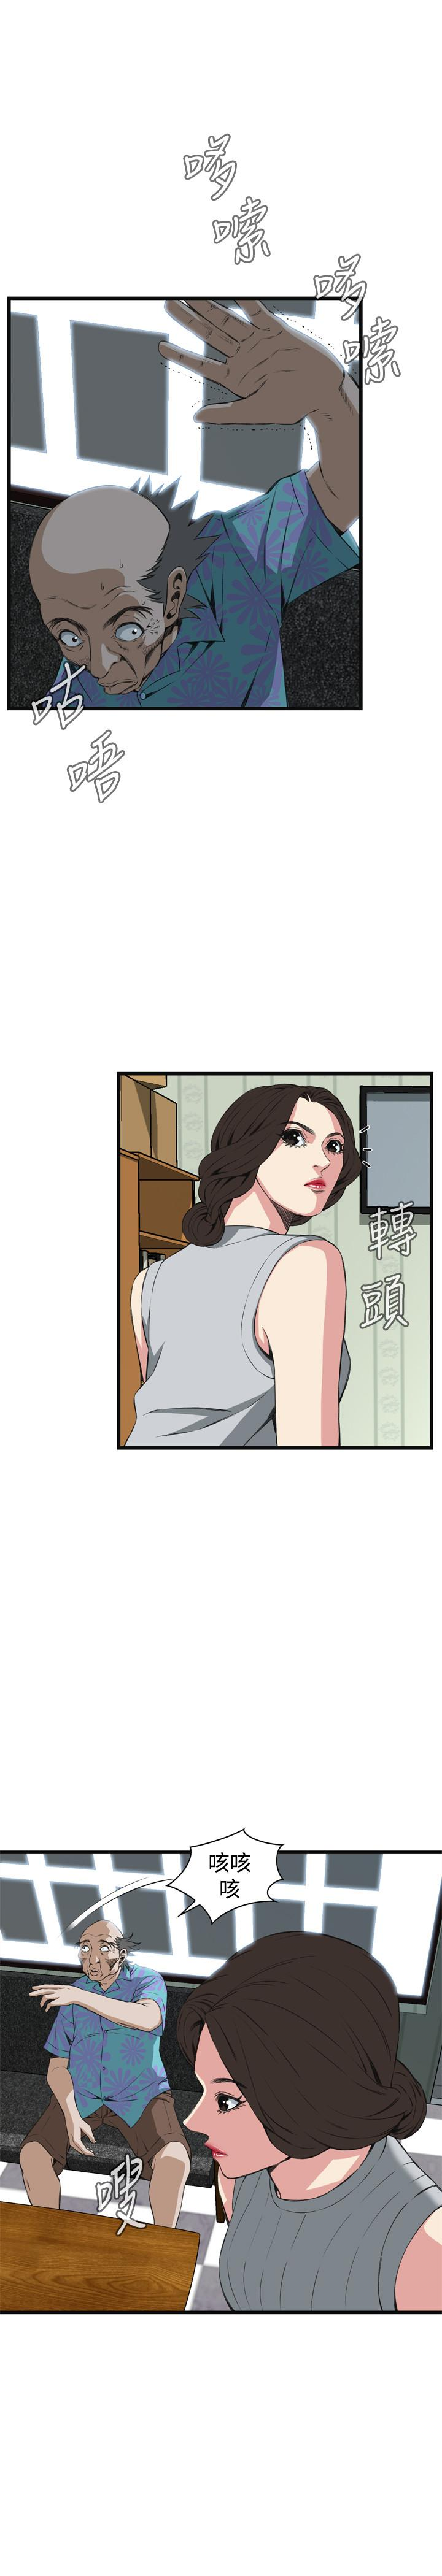 Take a Peek 偷窥 Ch.39~60 [Chinese]中文 627